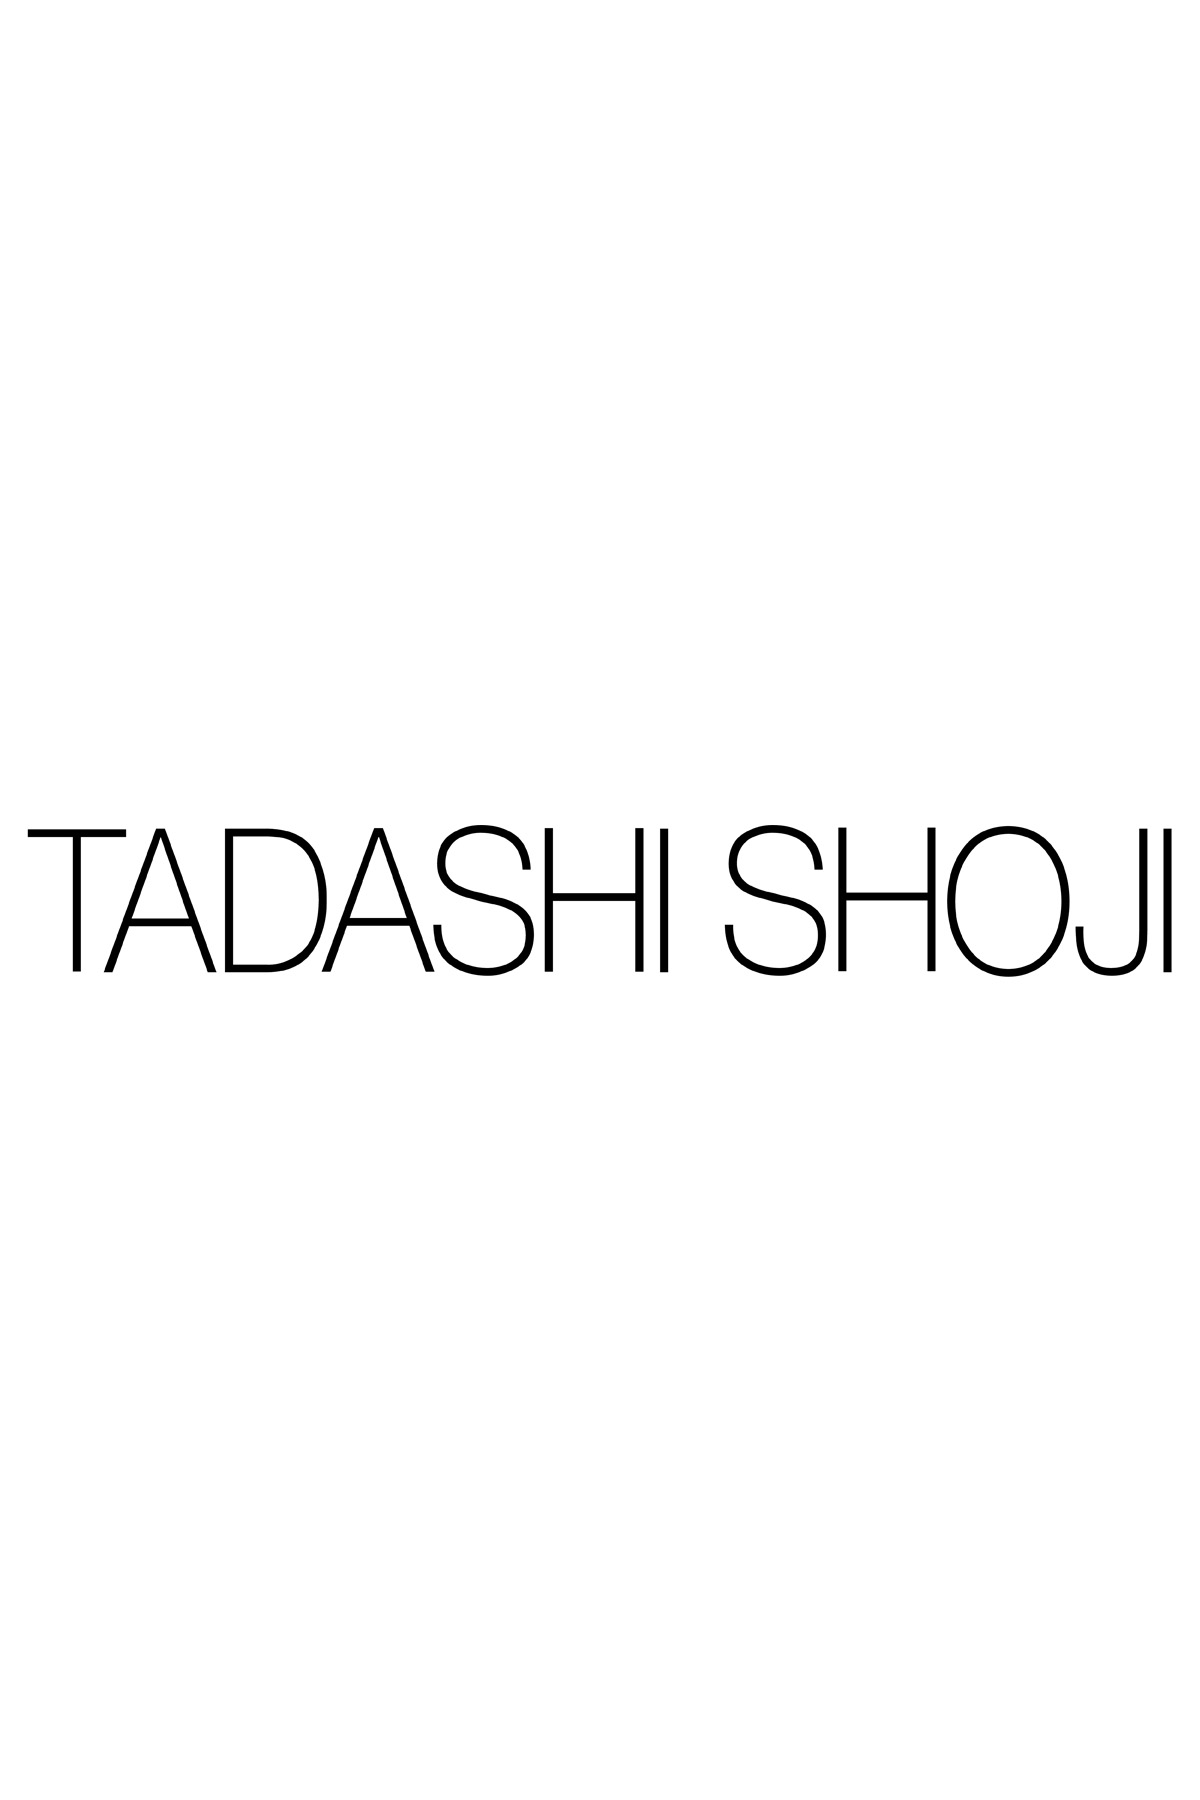 Tadashi Shoji - Corded Embroidery on Tulle Contrast Waist V-Neck Sheath Dress